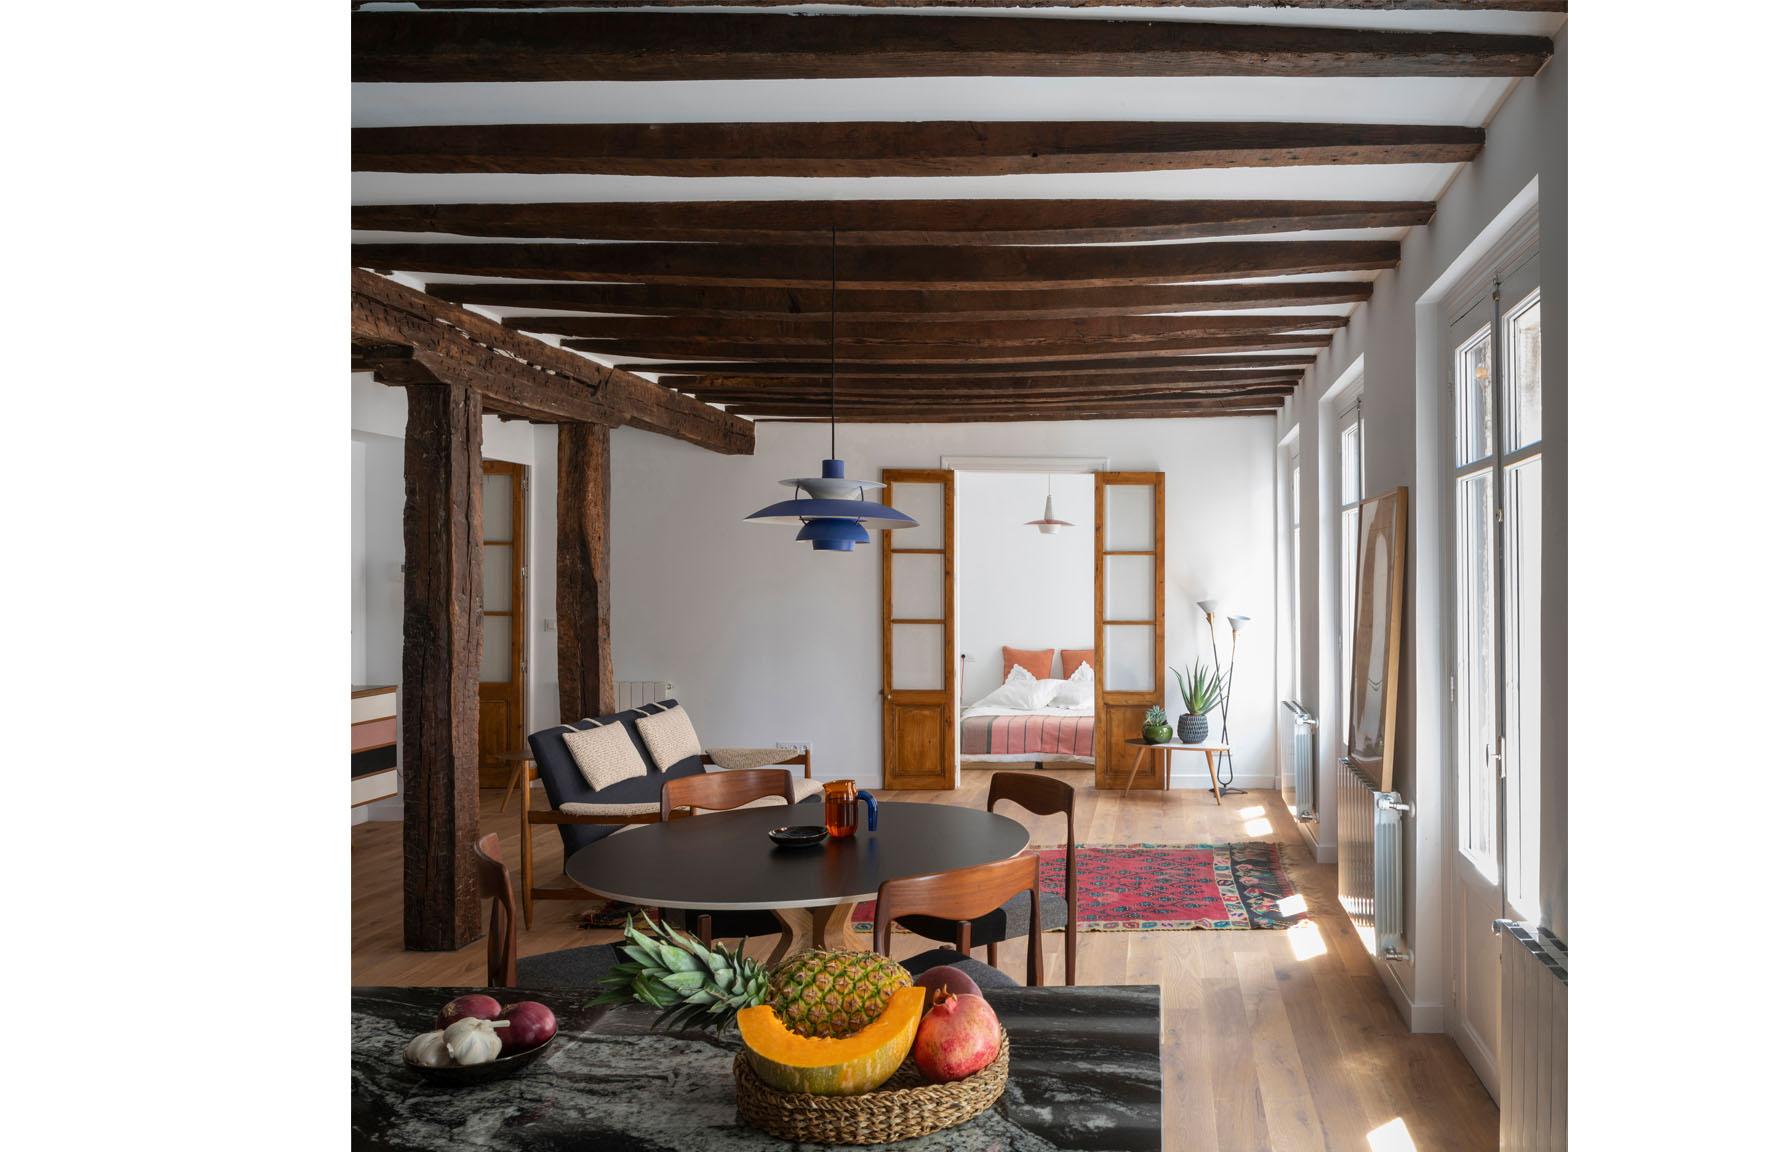 Apartment Esperanza-Bilbao-Image 04.jpg